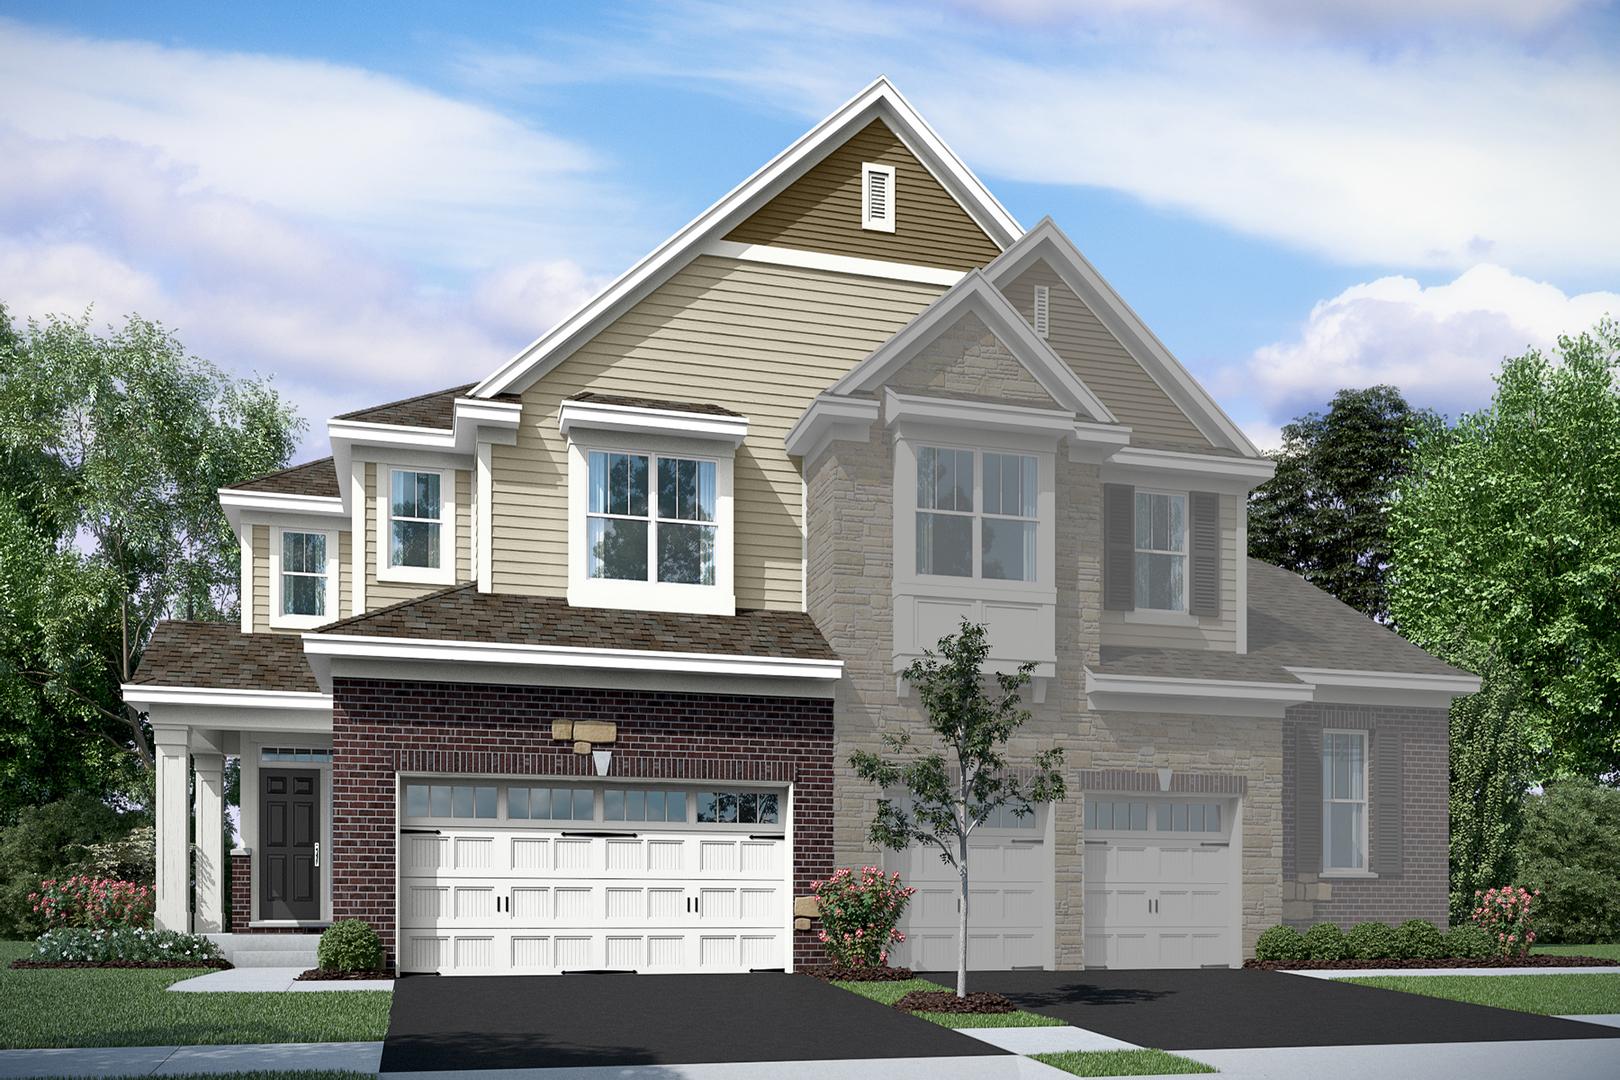 23131 N Pinehurst Lot # 78.01 Drive, Kildeer, Il 60047